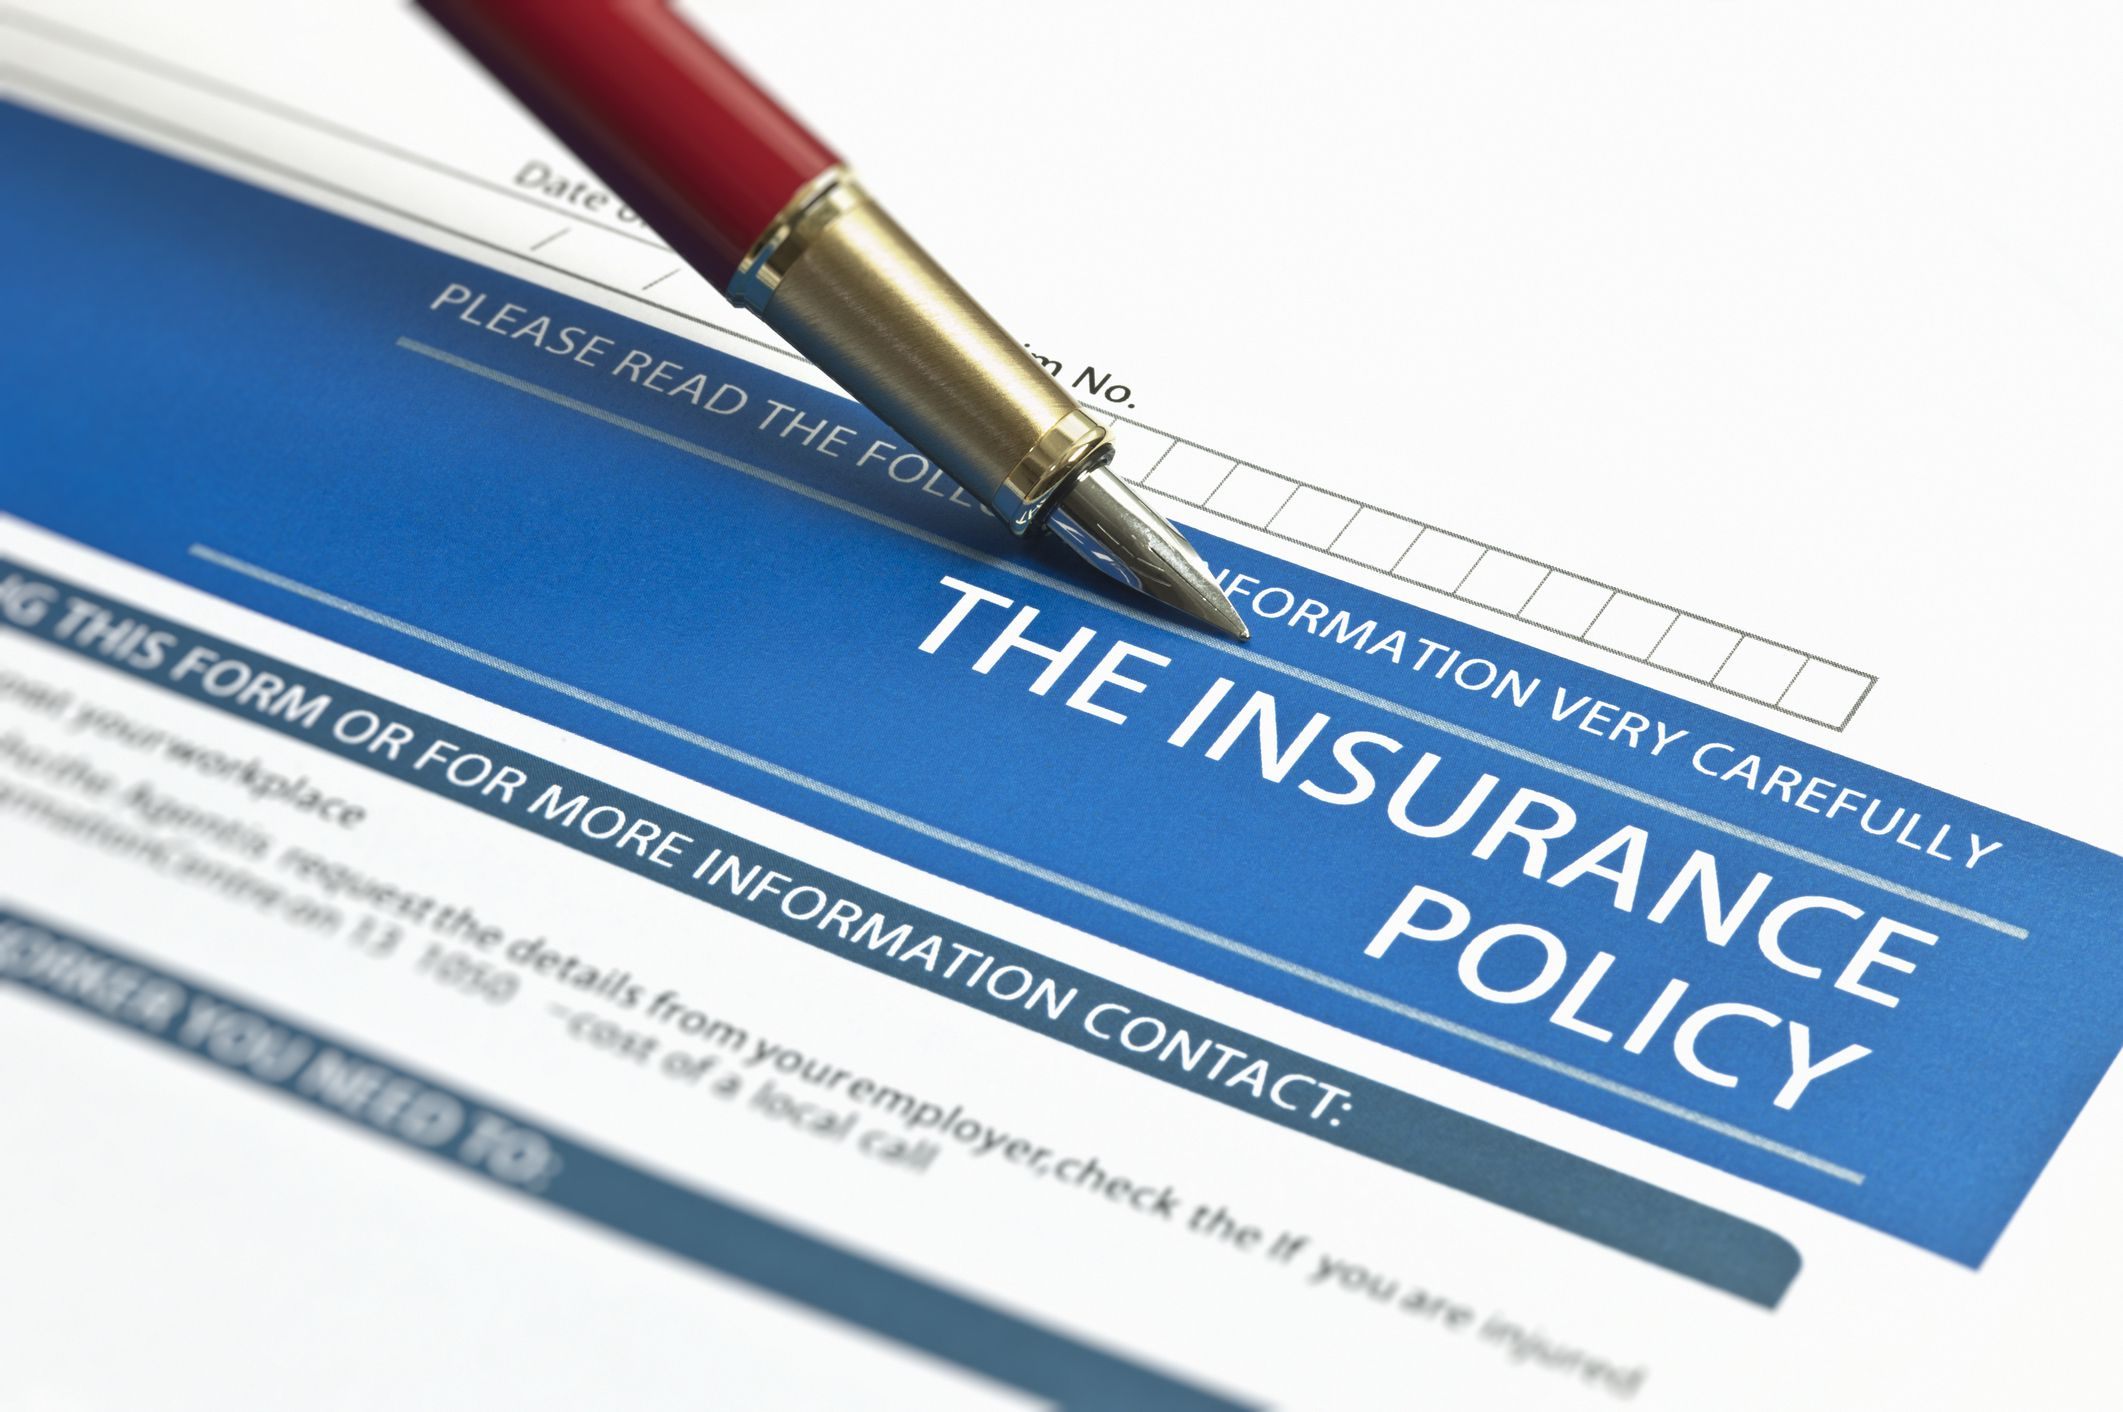 Netcycle cargo insurance